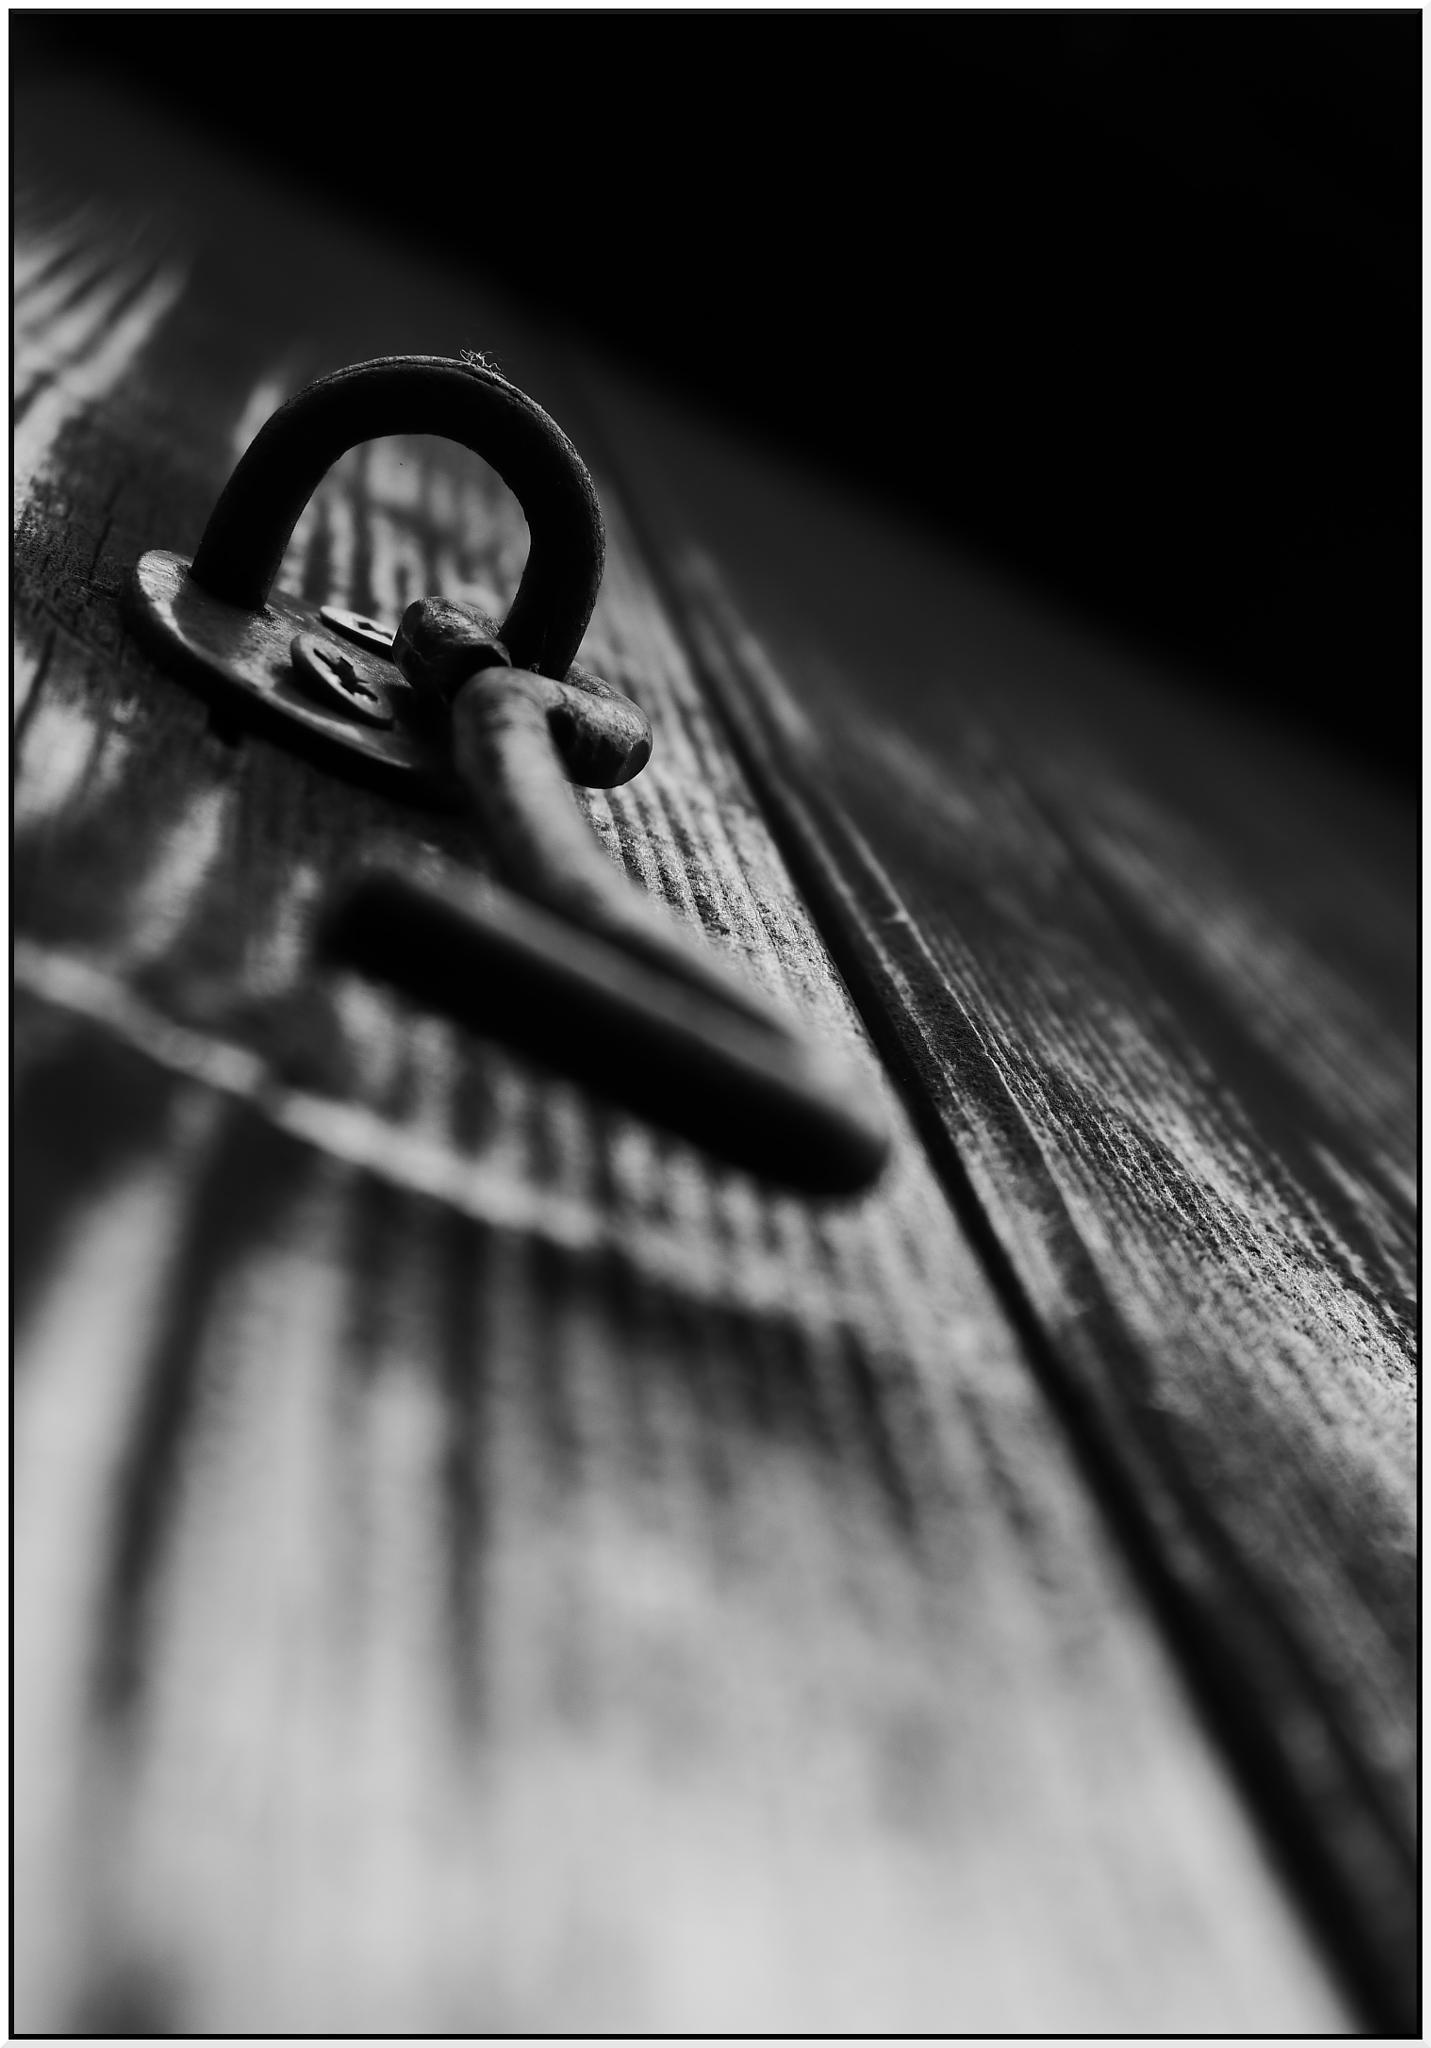 Hook by phillip.carey